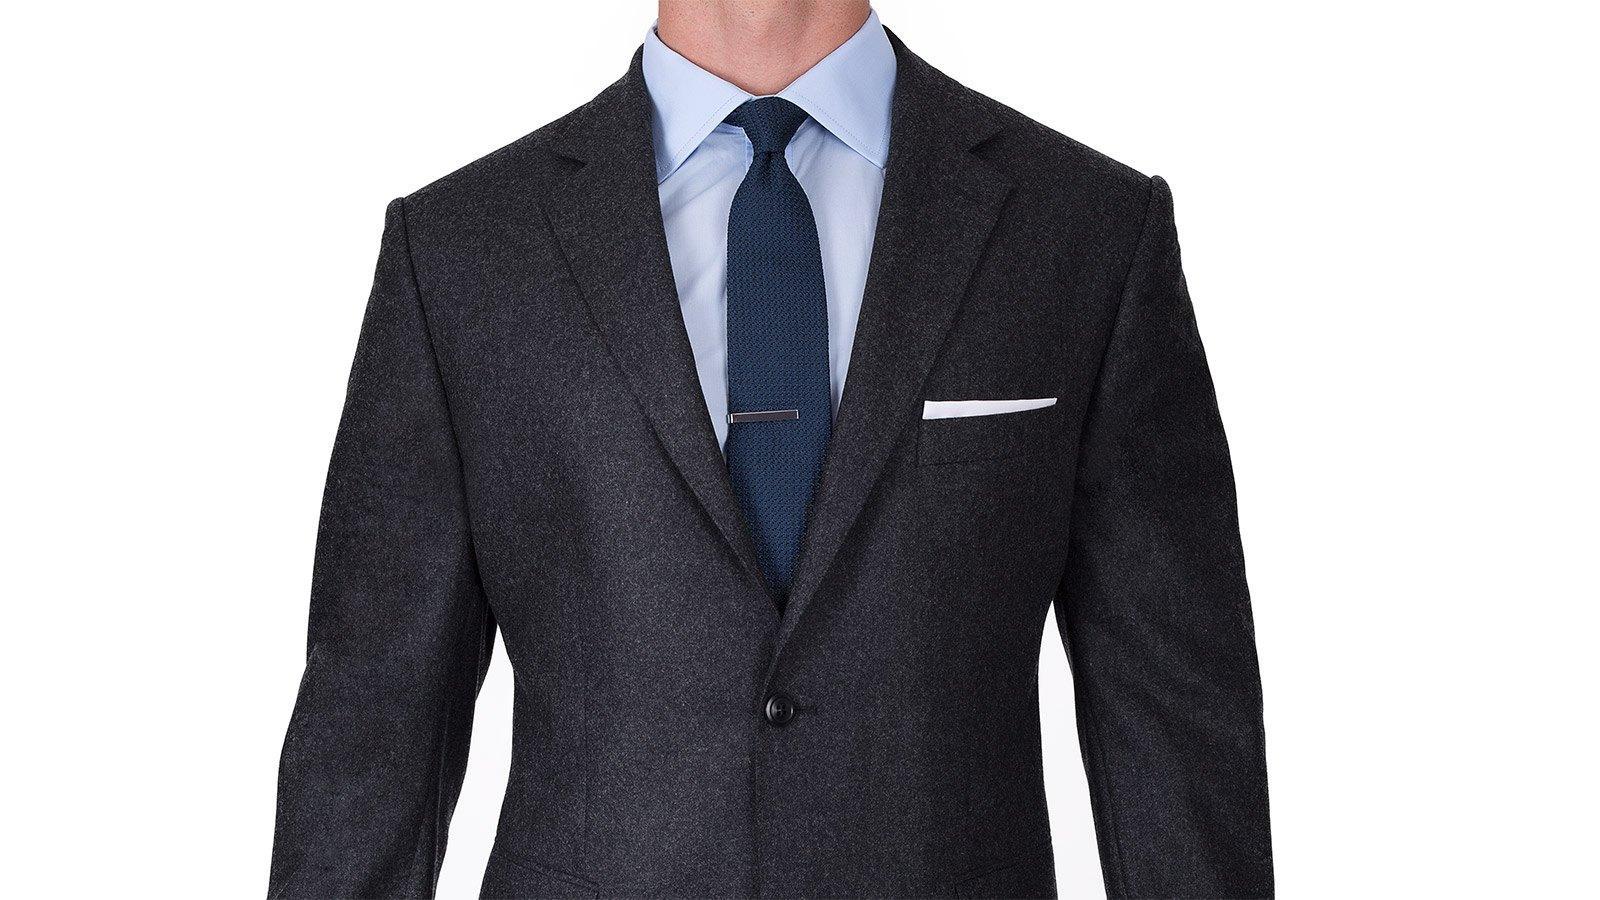 Charcoal Flannel 3 Piece Suit - slider image 1